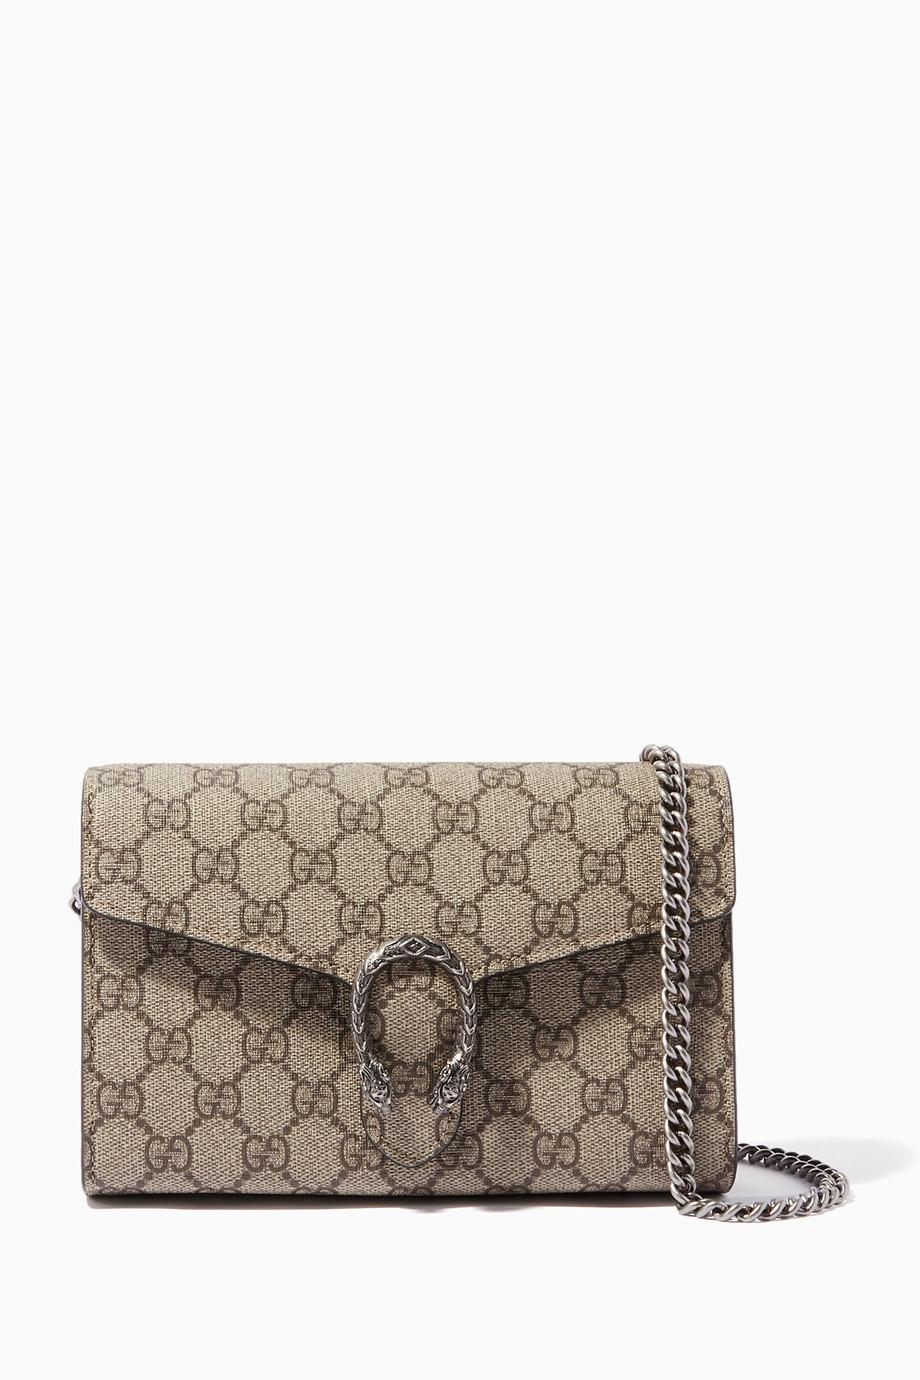 4d8186f5cc7 Shop Gucci Brown Beige Mini Dionysus Leather Chain Shoulder Bag ...